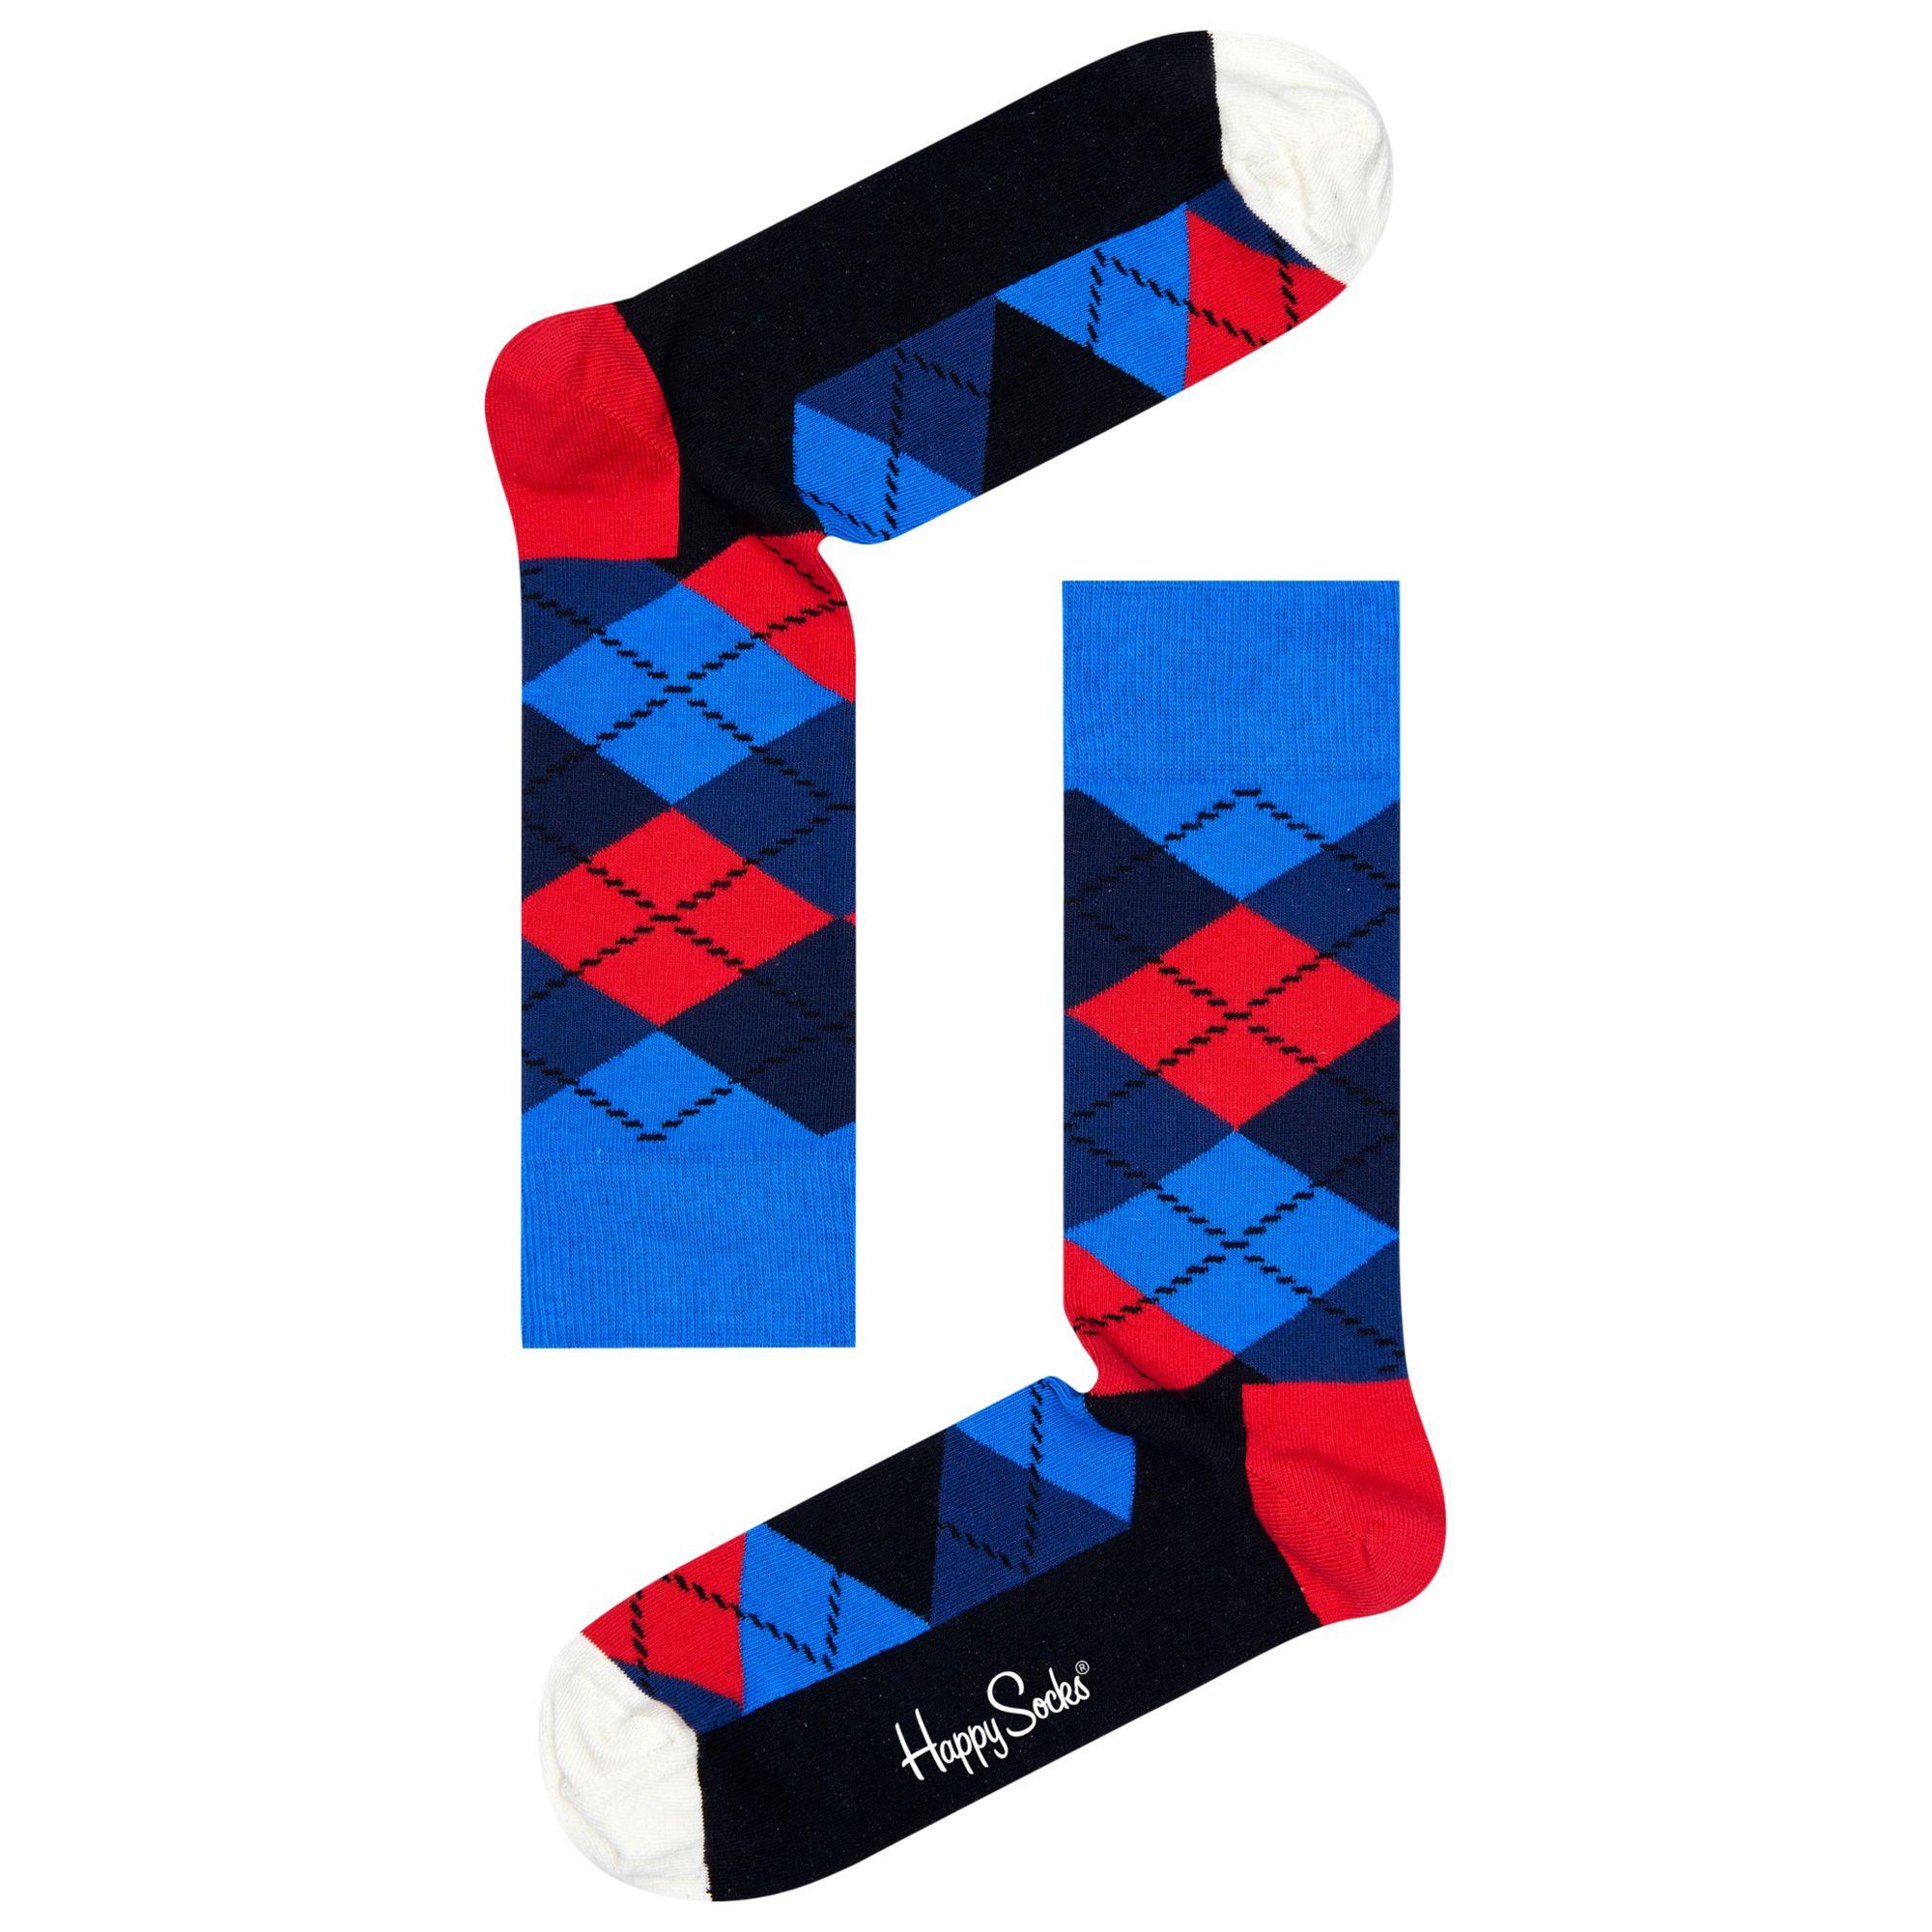 Happy Socks Happy Socks Argyle Socks, One Size